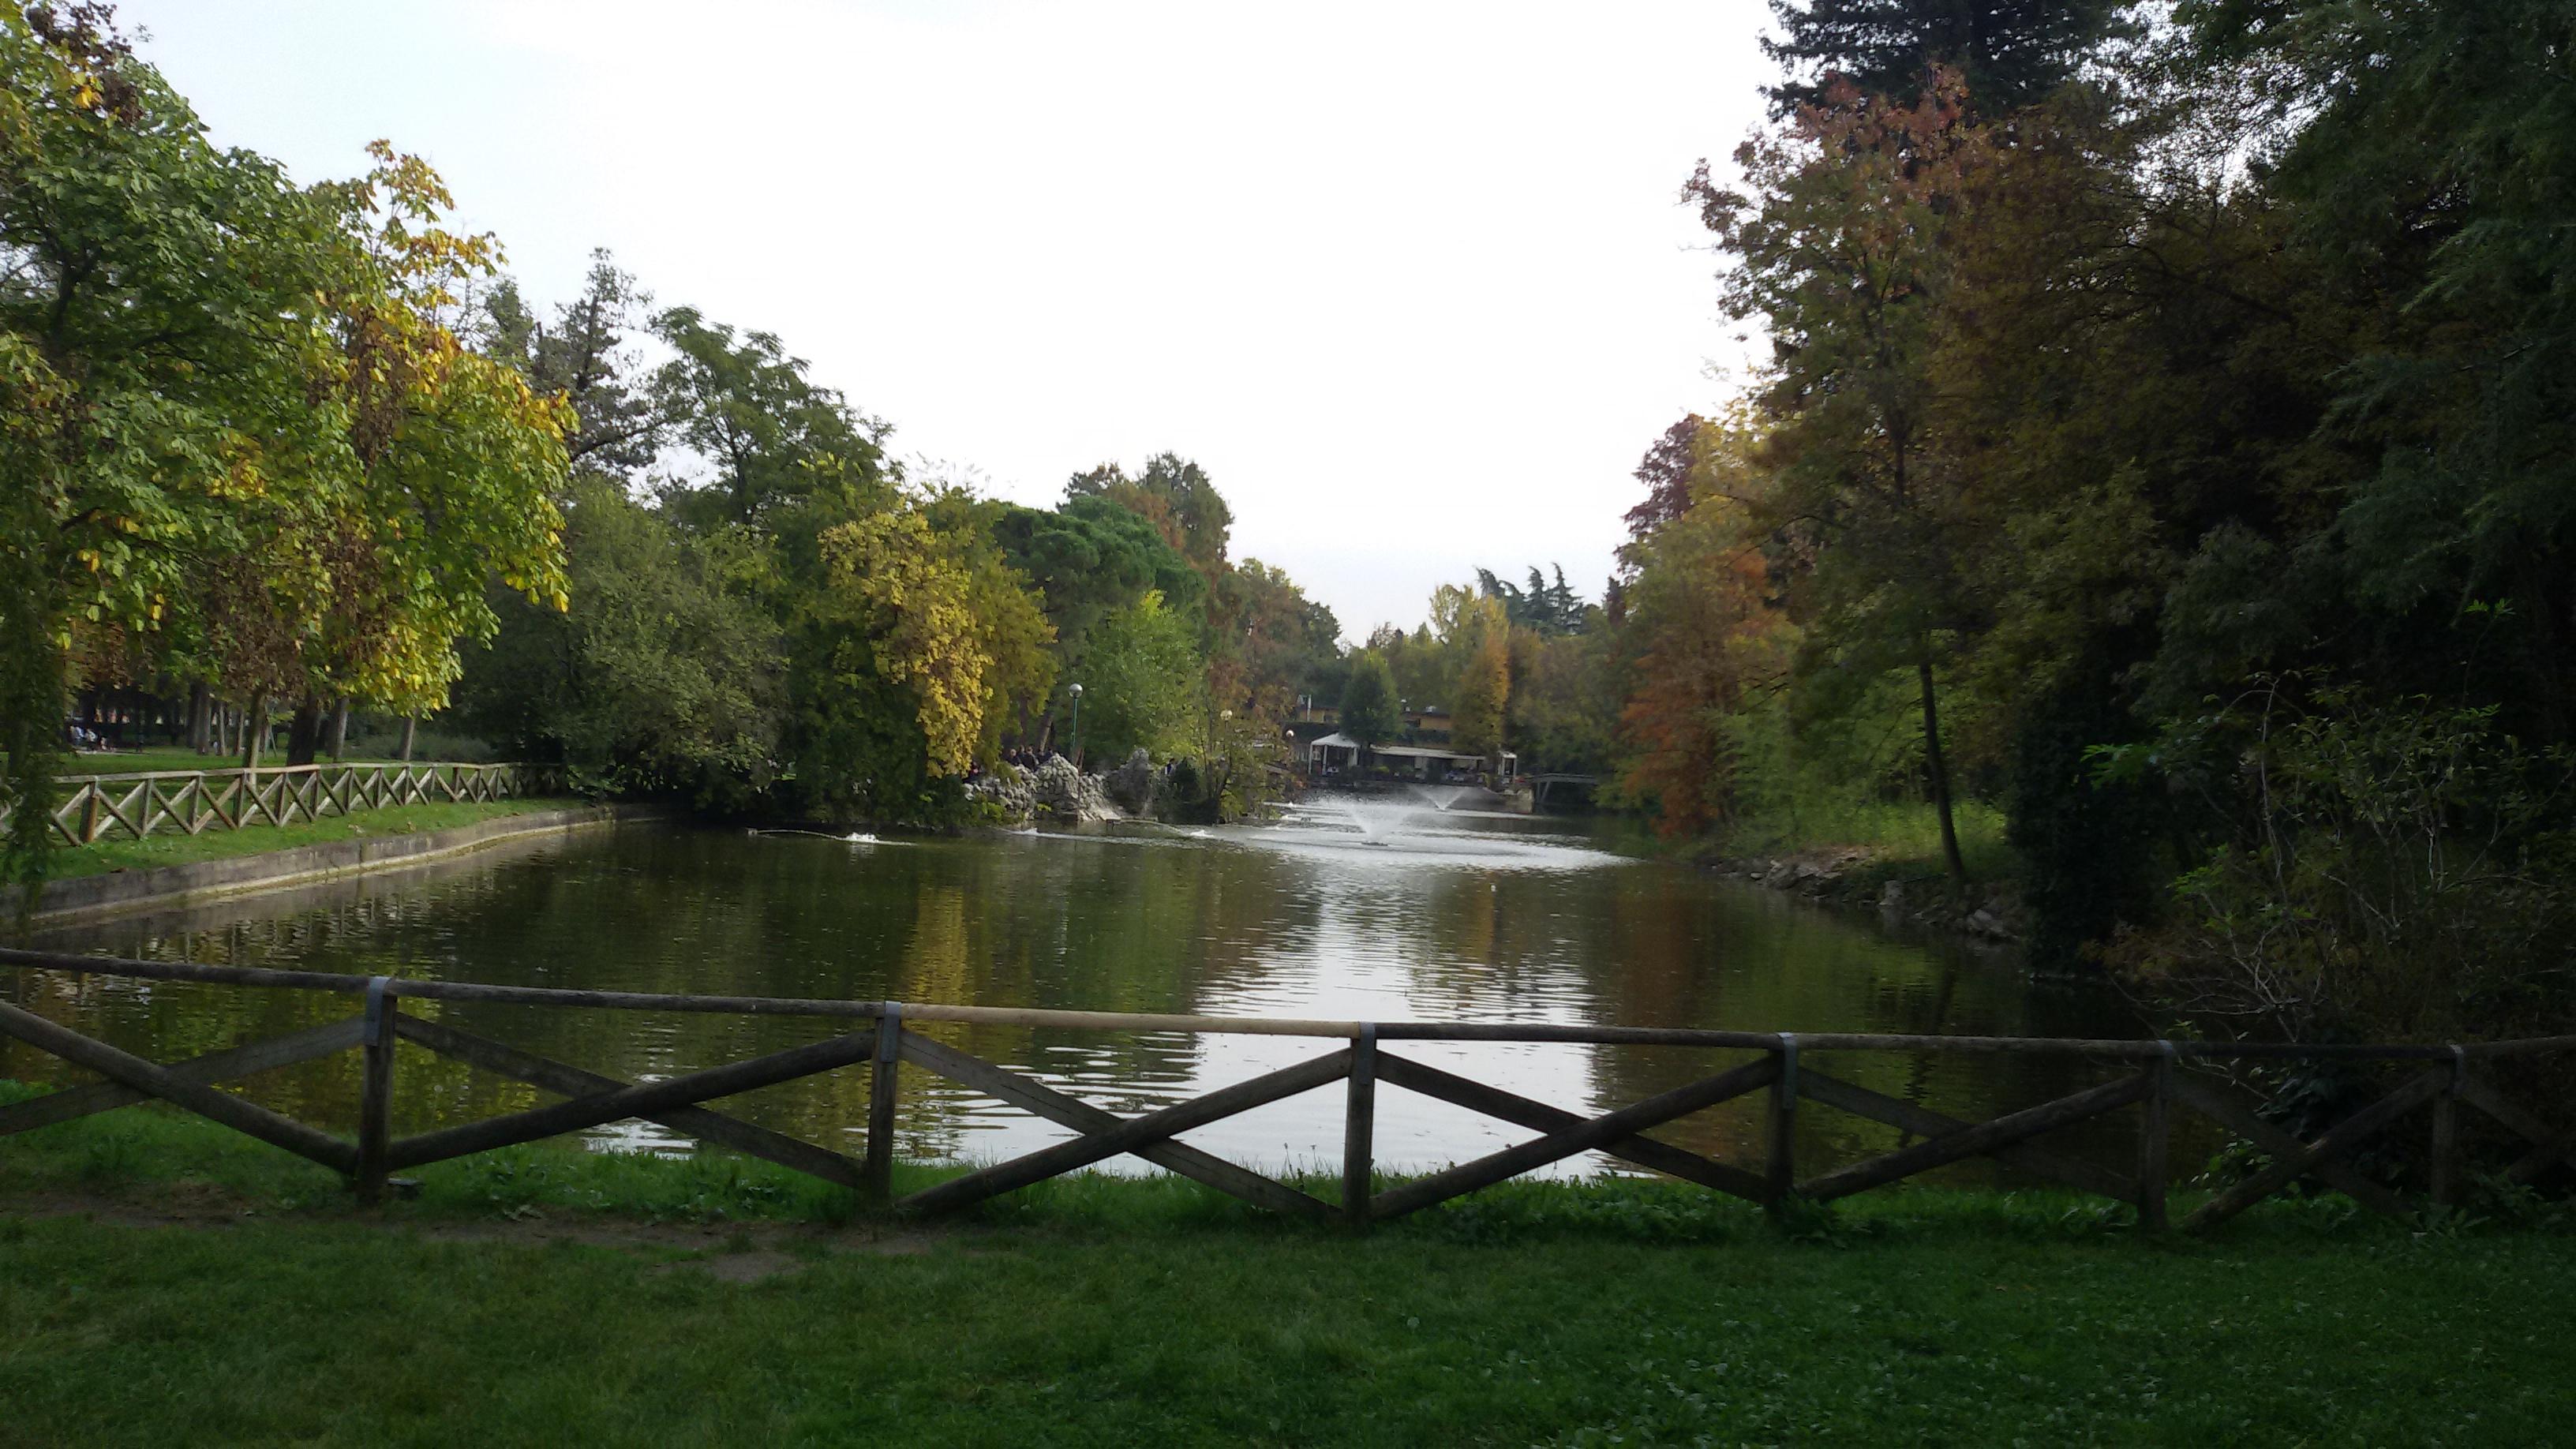 File:giardini margherita bologna.jpg wikimedia commons